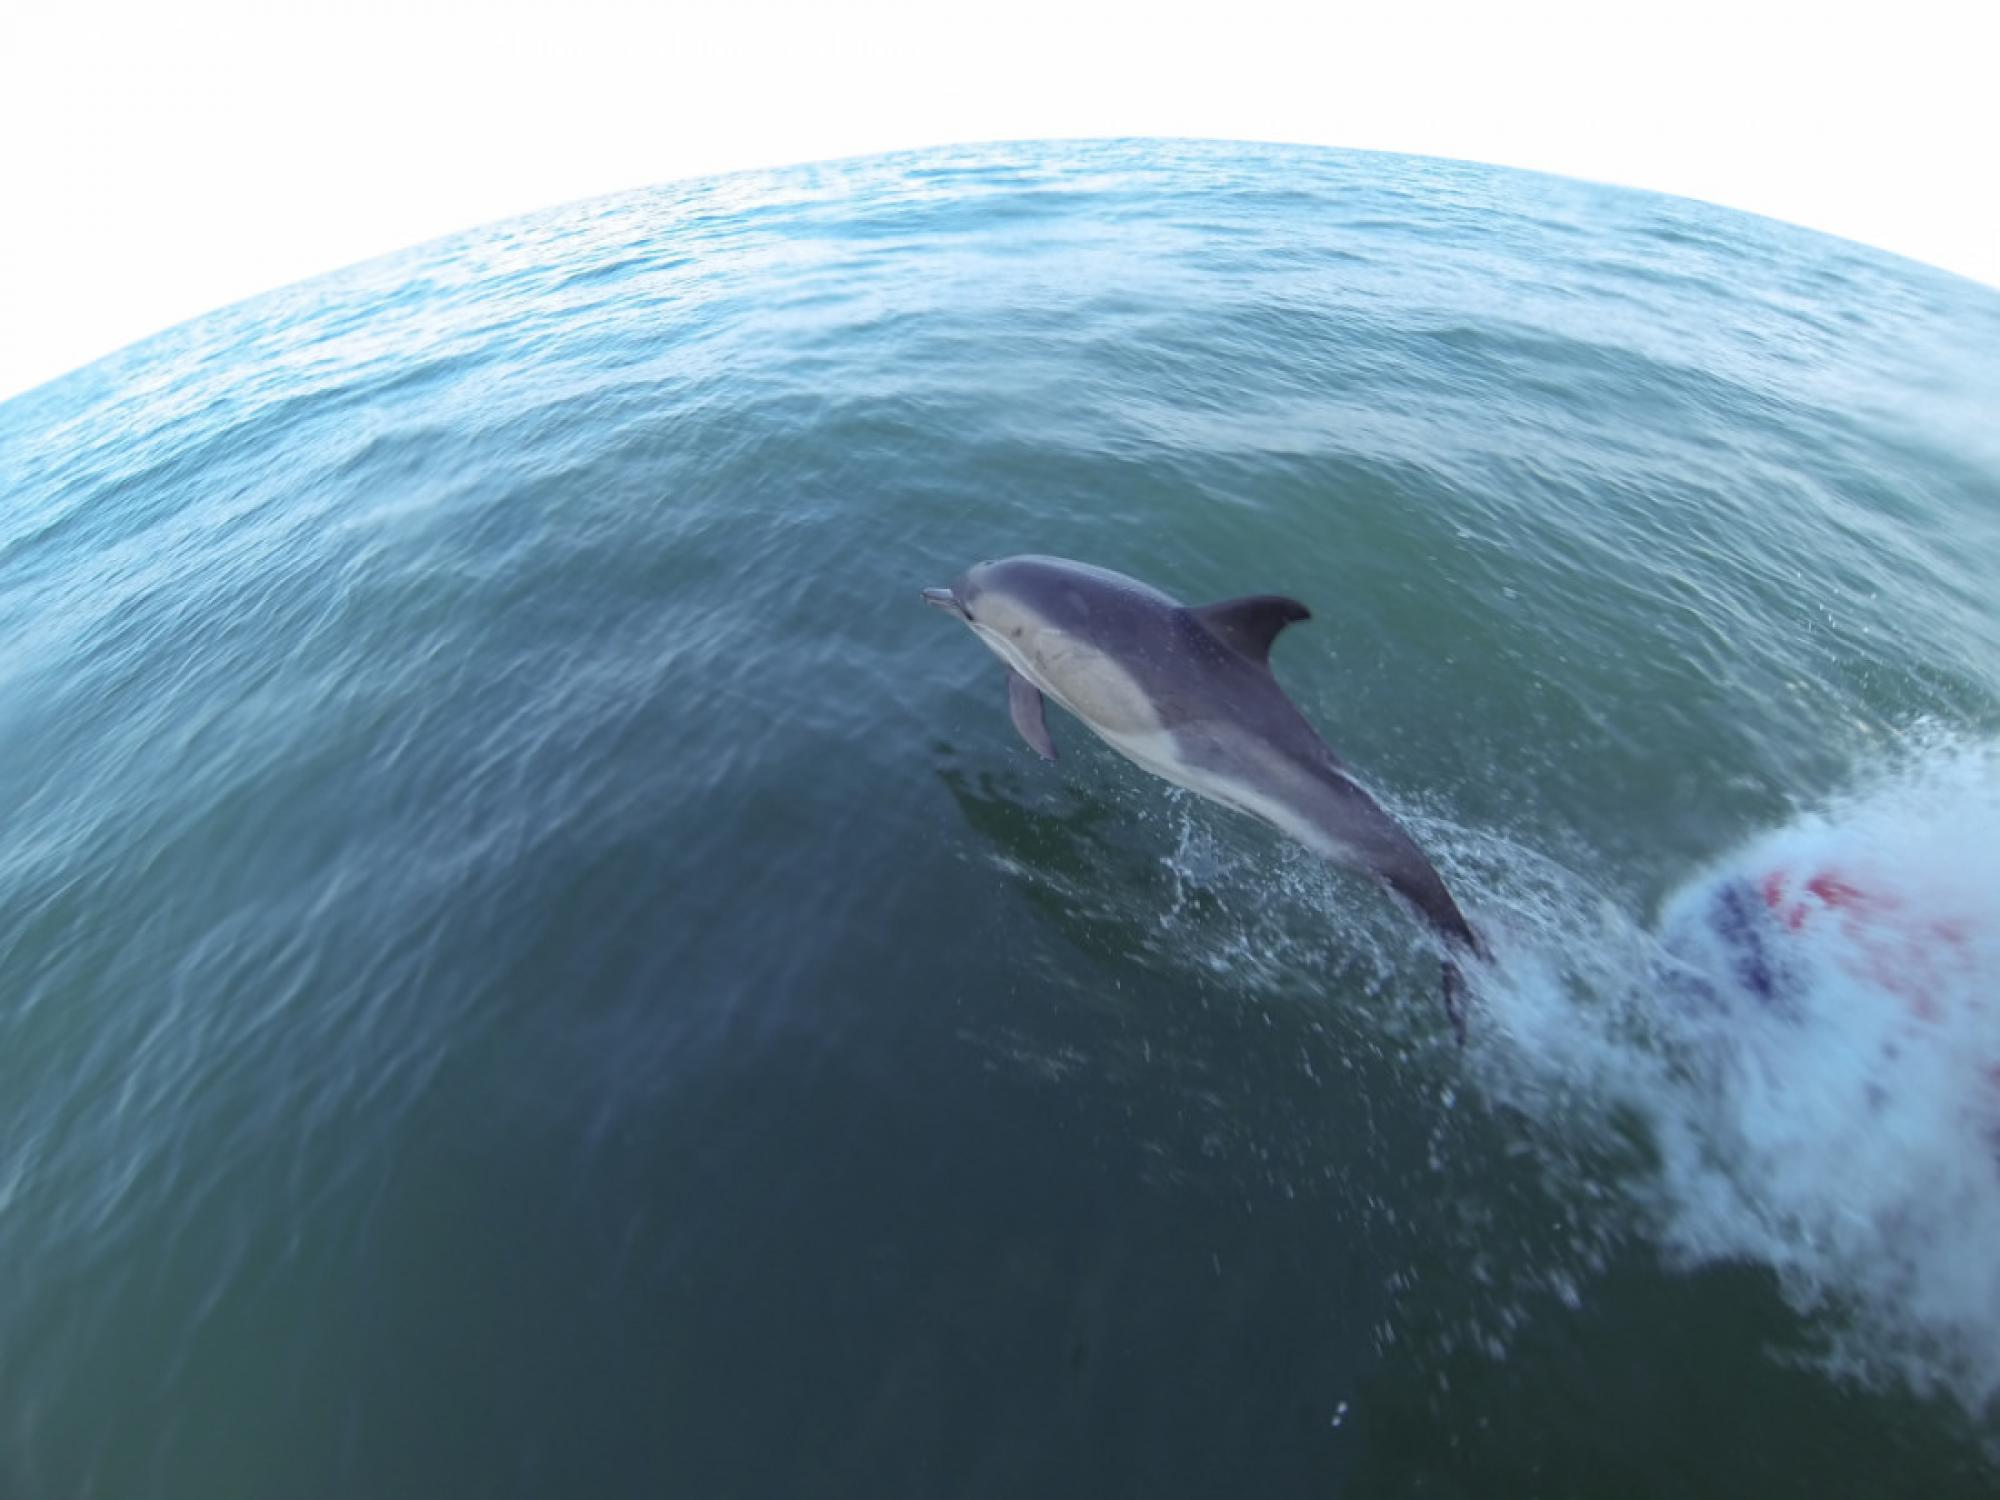 Common Dolphin Newquay Cornwall UK